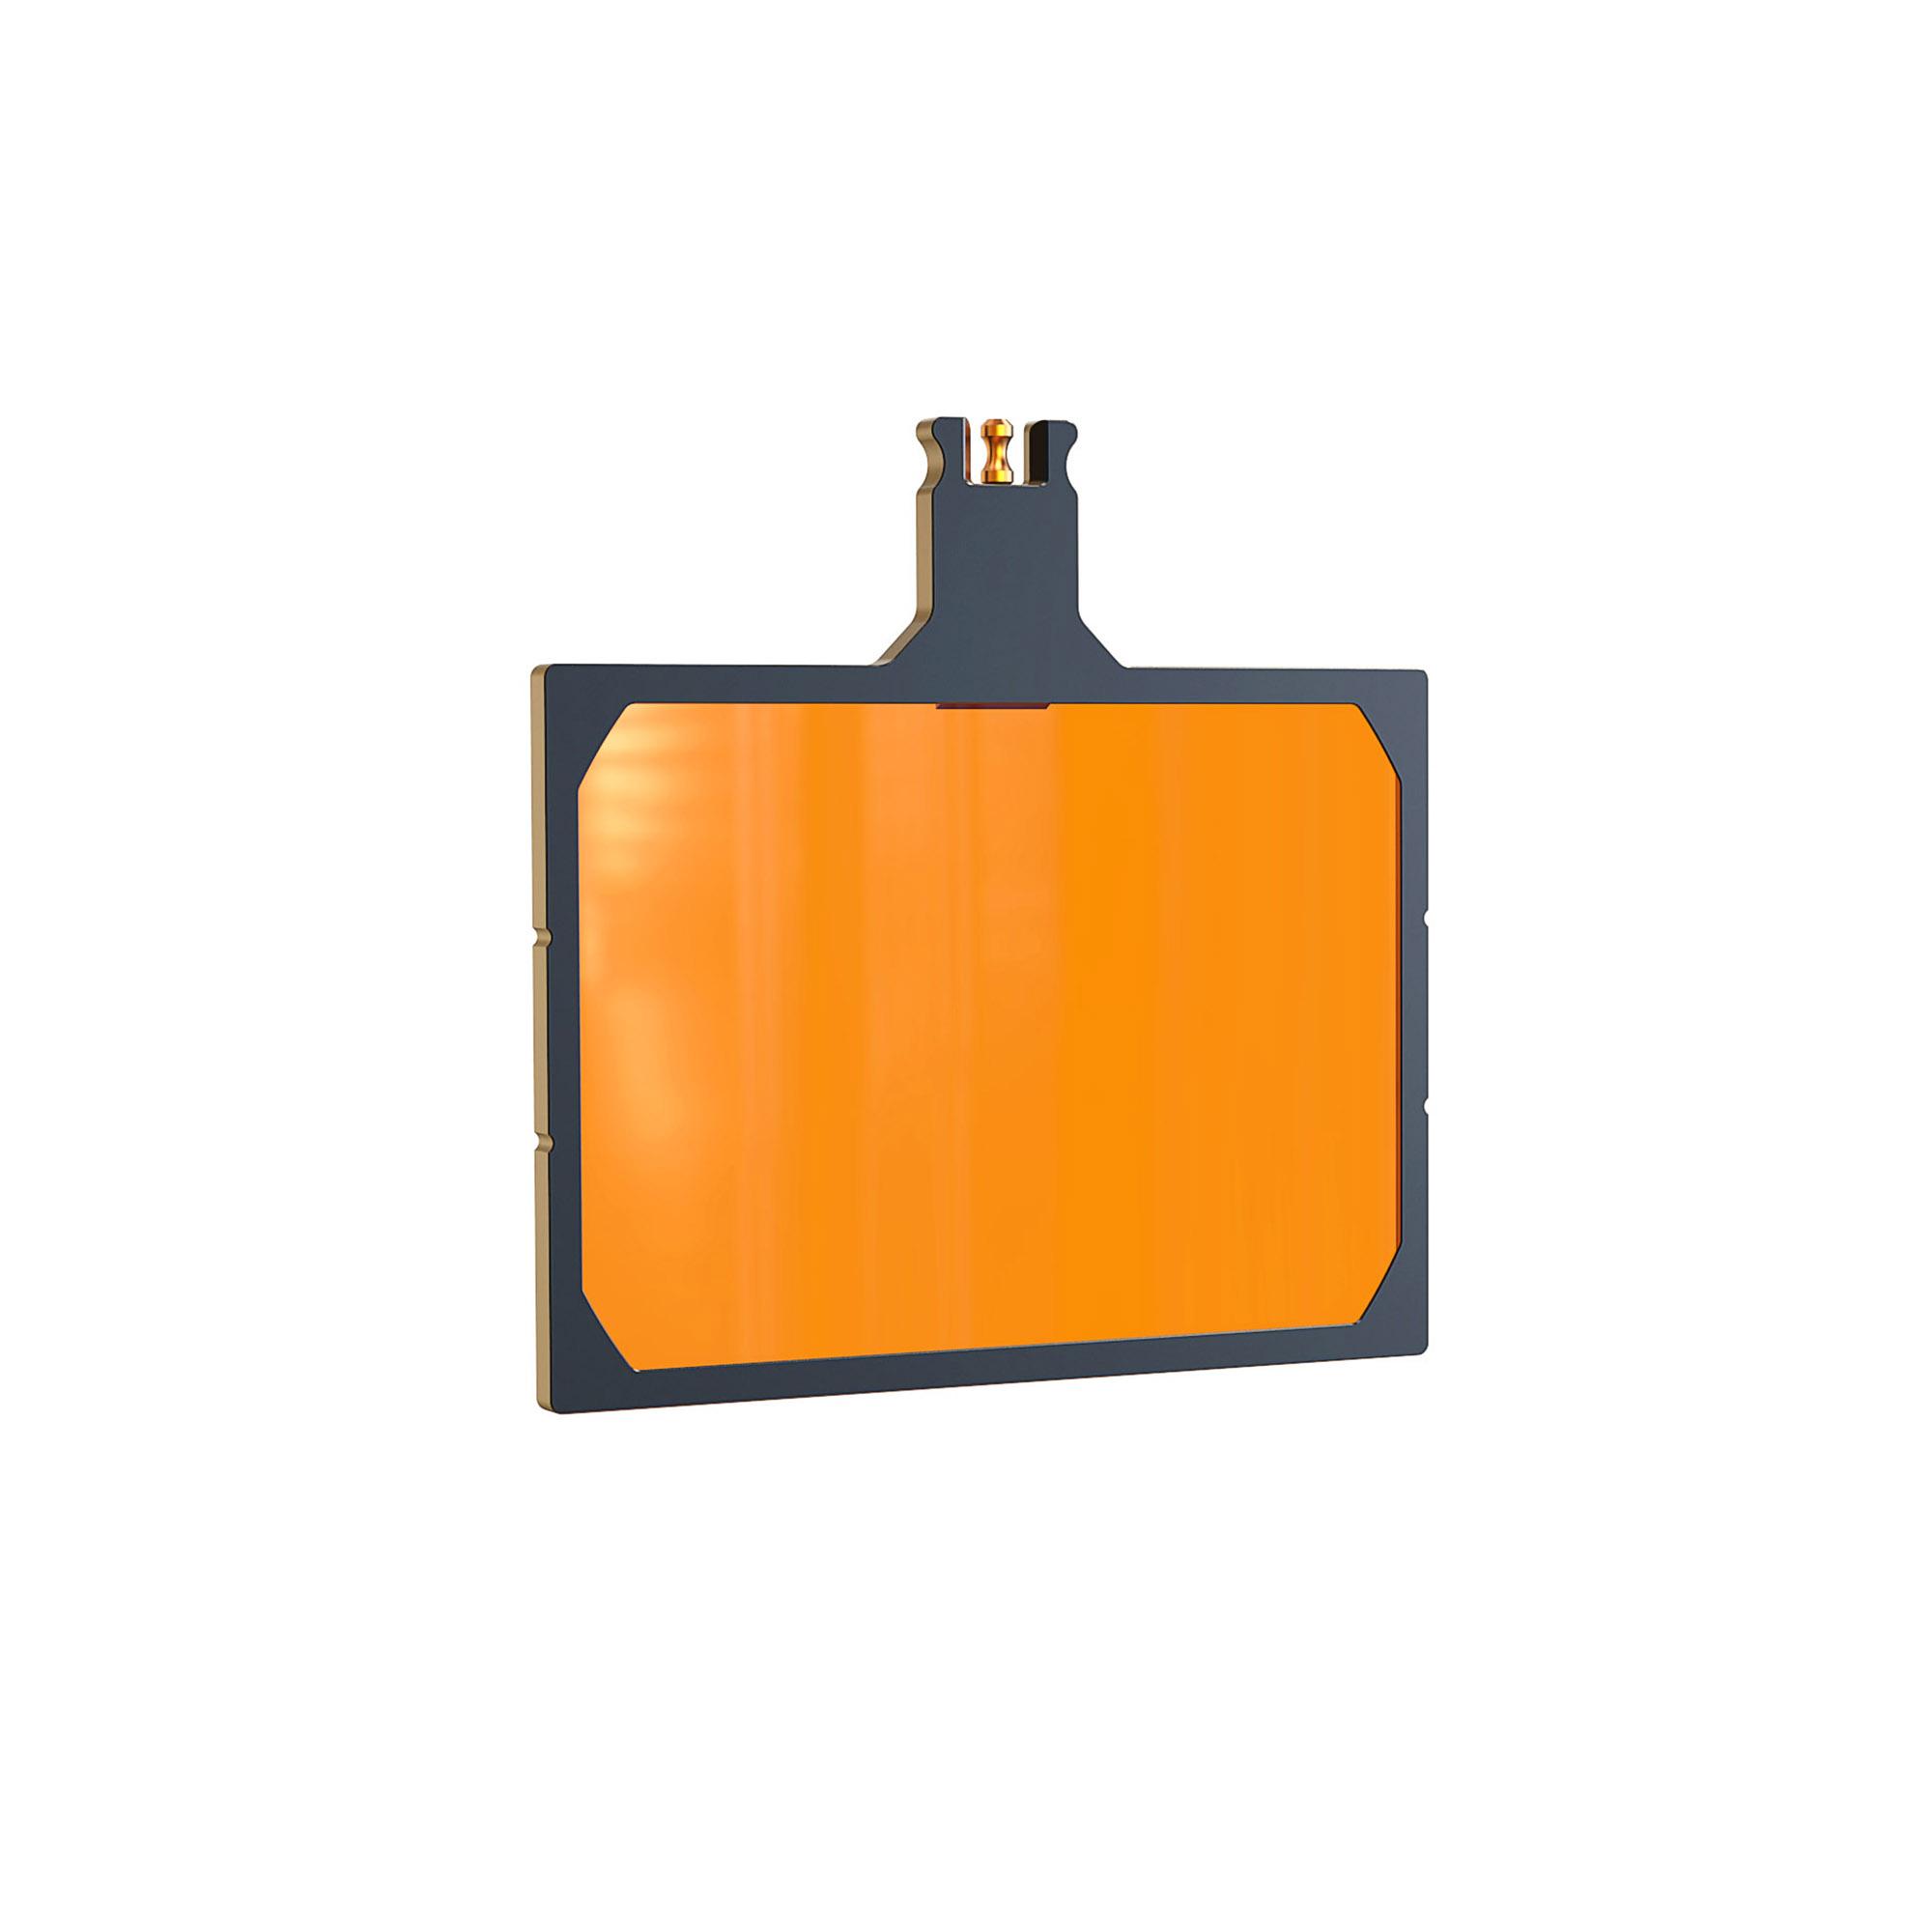 b1251.1008   viv 4 x 5.65   filter tray   1